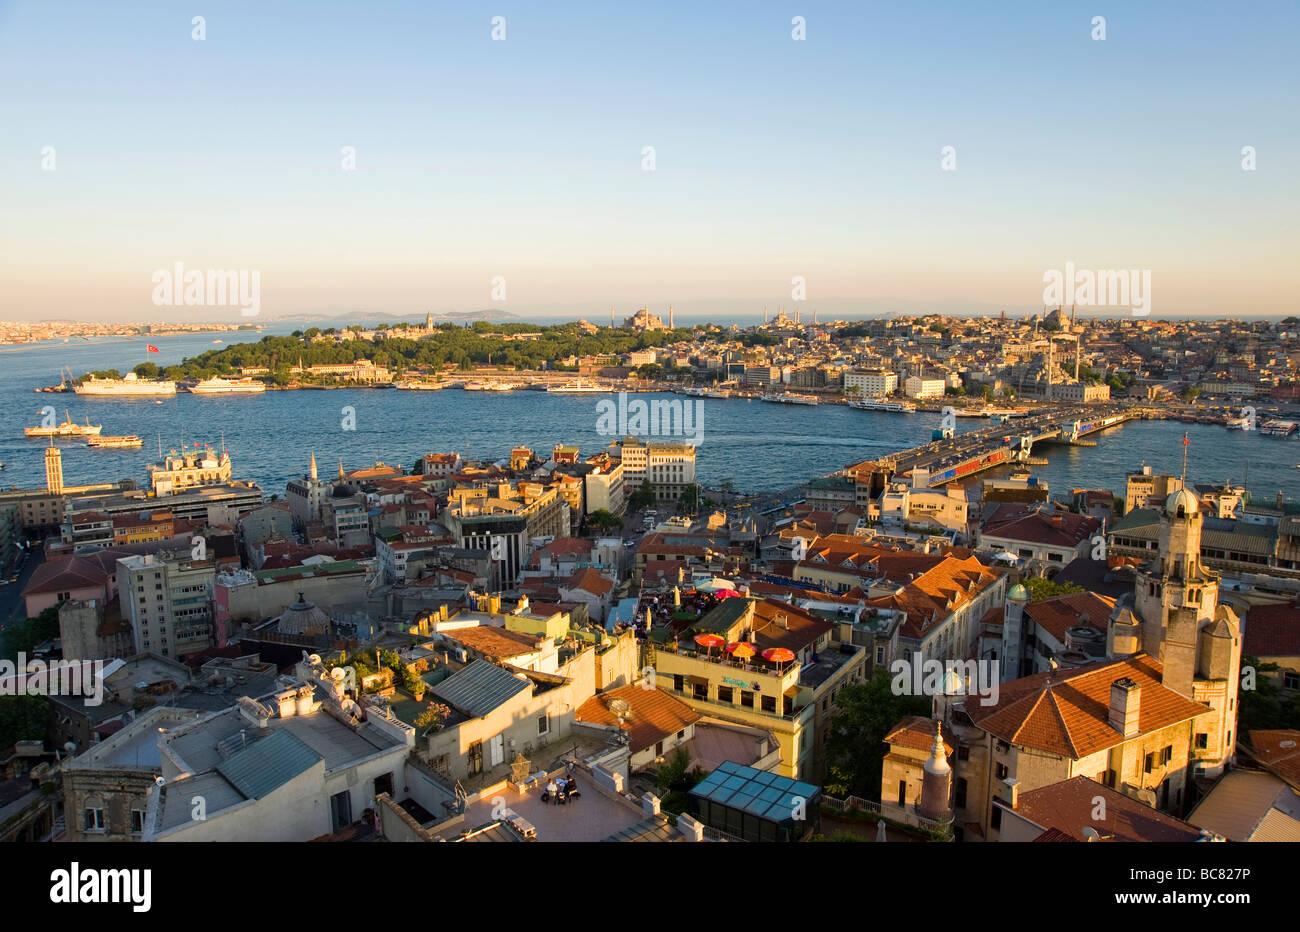 El Golden Horn visto desde la torre de Galata Estambul Turquia Imagen De Stock